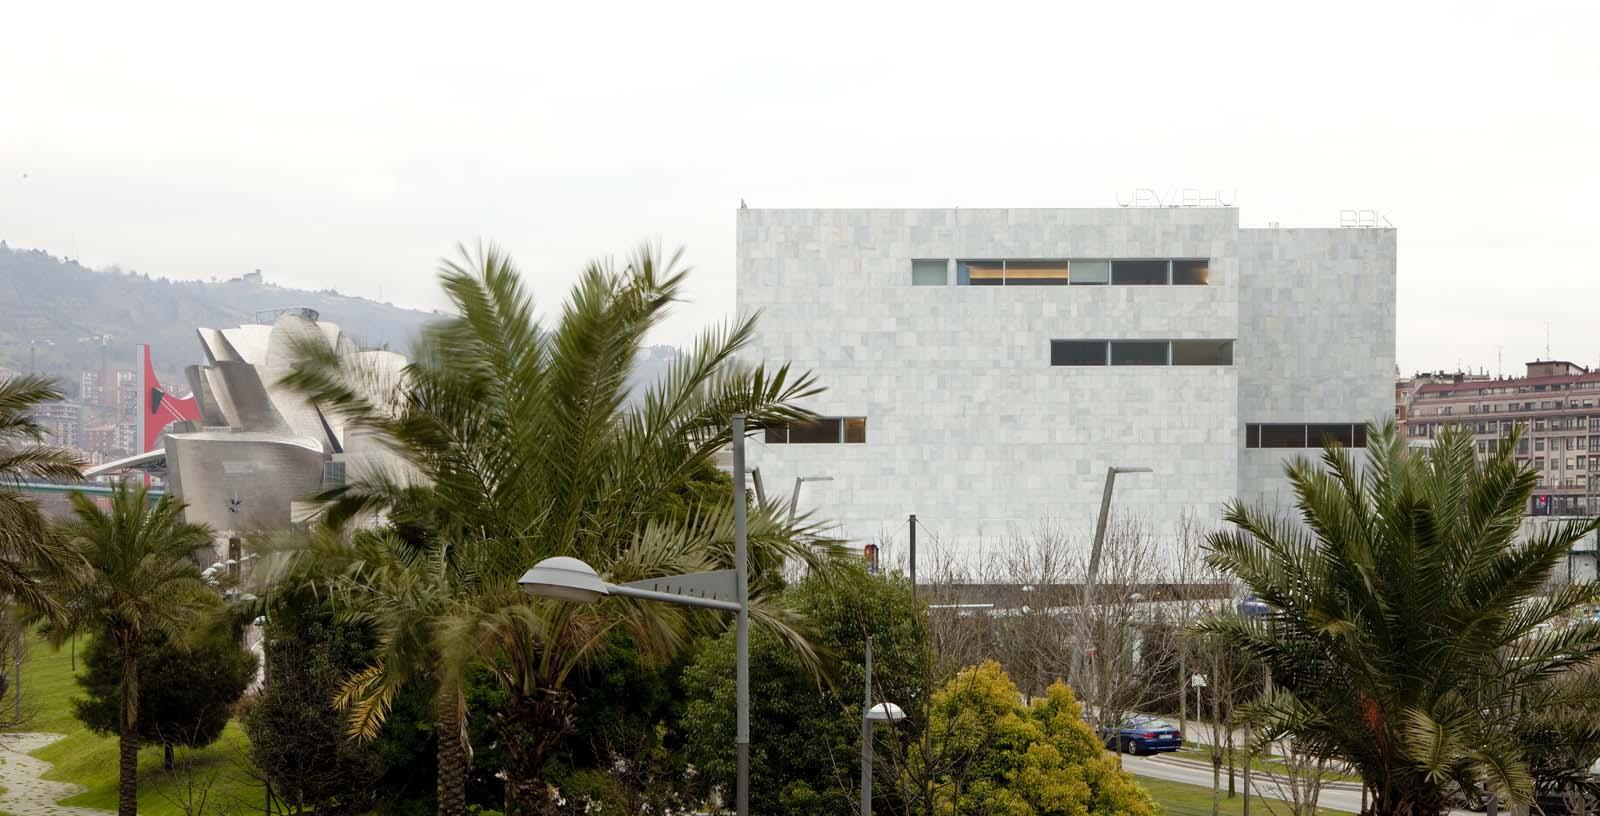 auditorium in basque country university_PRINCIPAL_Architecture_IDOM